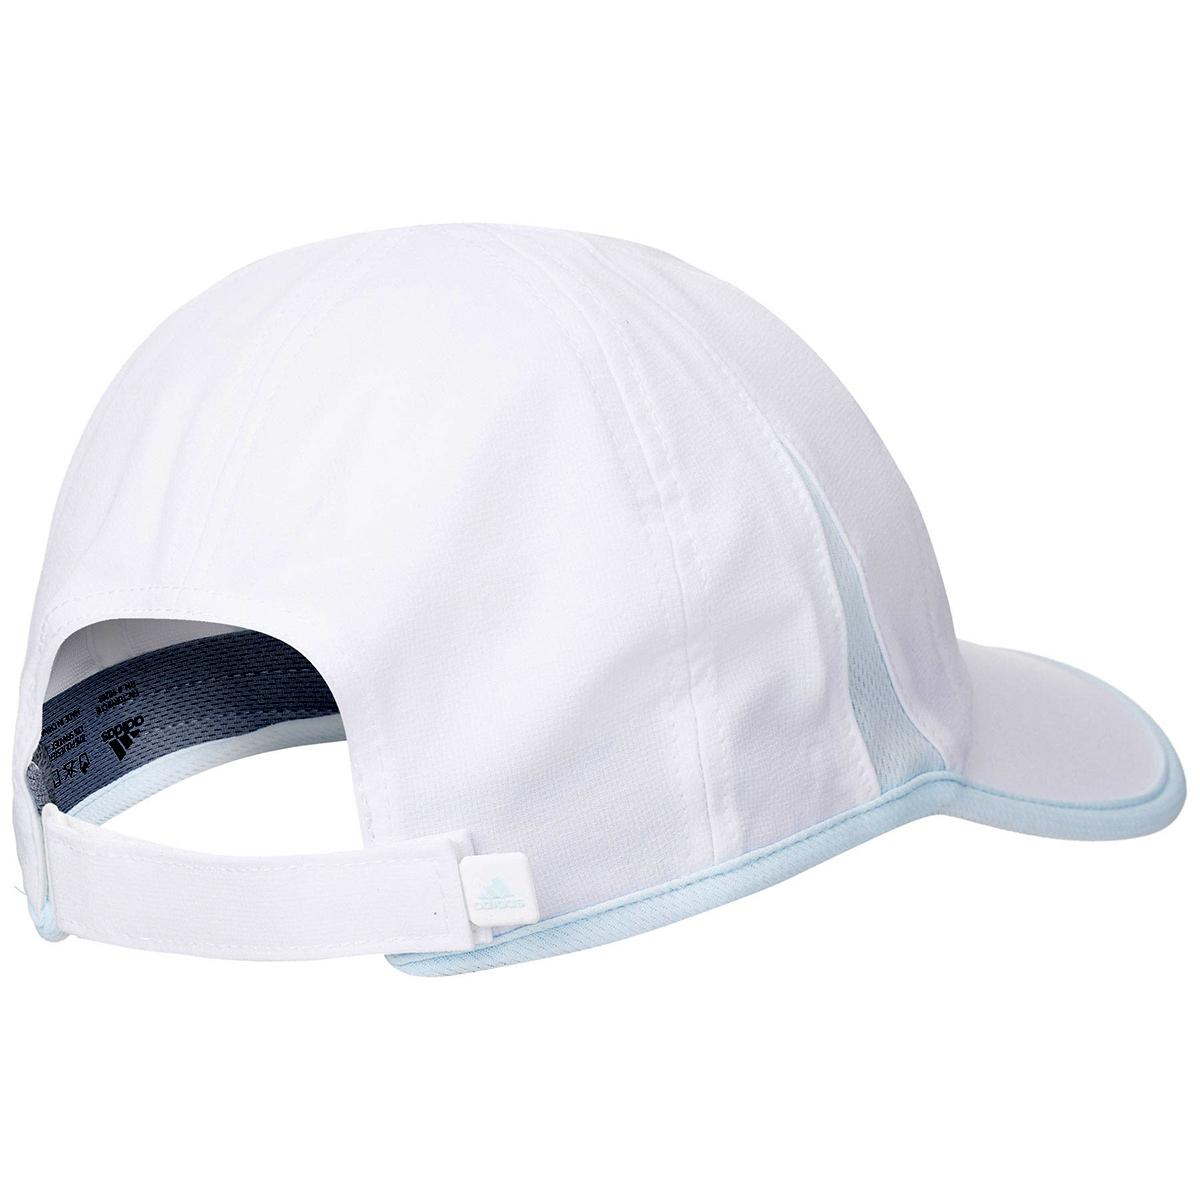 Women's Adidas Superlite Cap - Color: White/Sky Tint Blue - Size: One Size, White/Sky Tint Blue, large, image 2